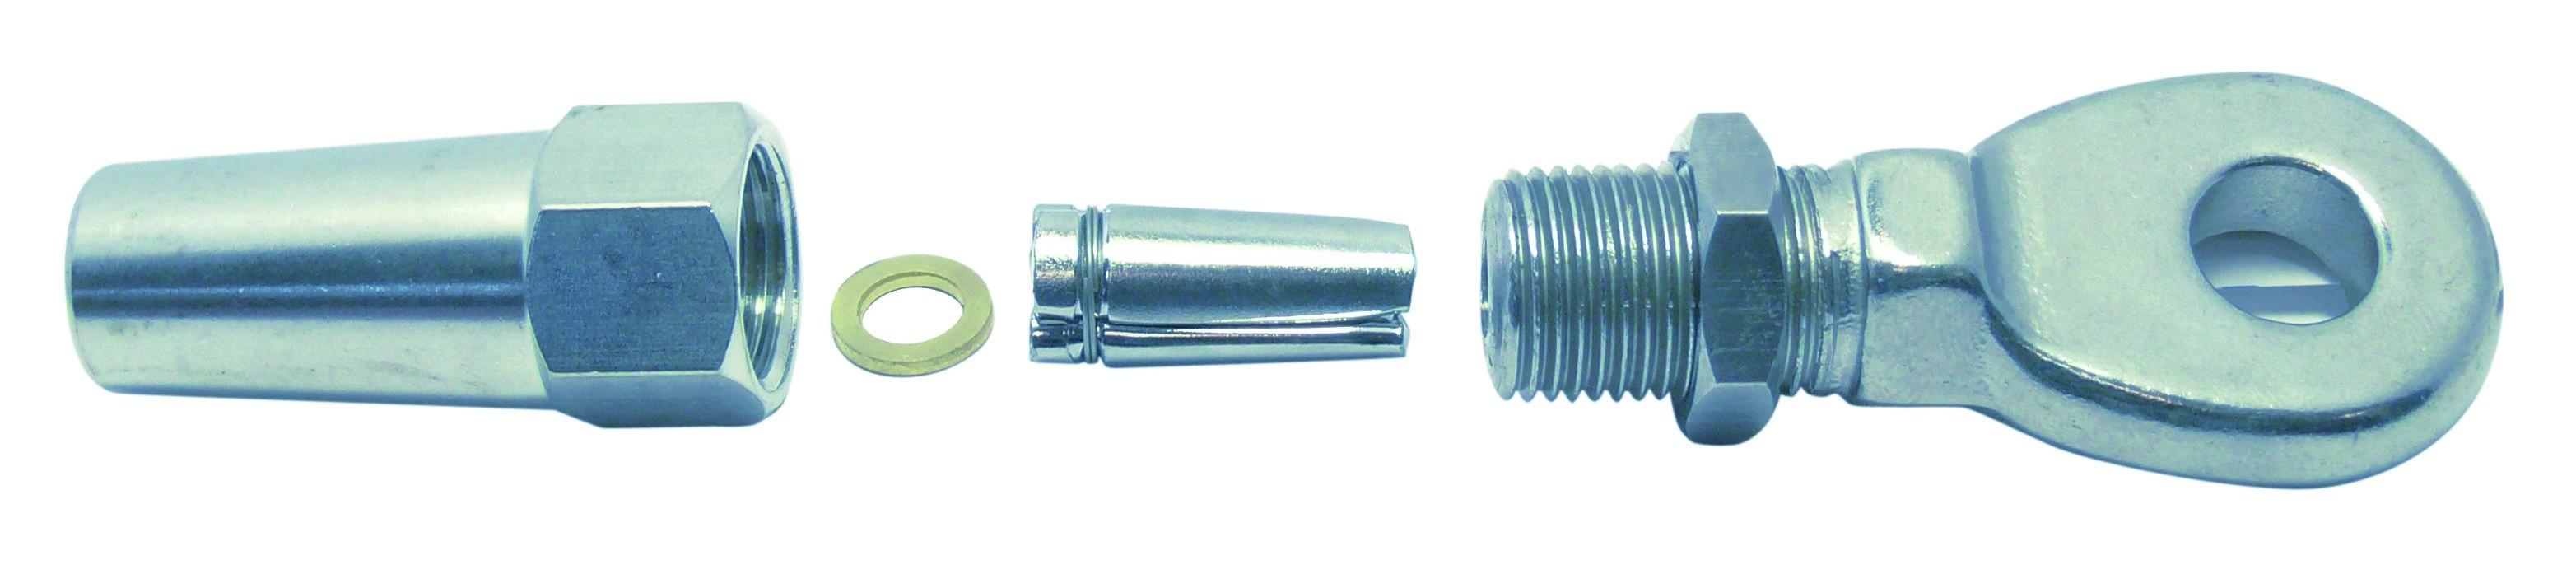 DHZ-oogterminal 8mm RVS A4 1 stuks